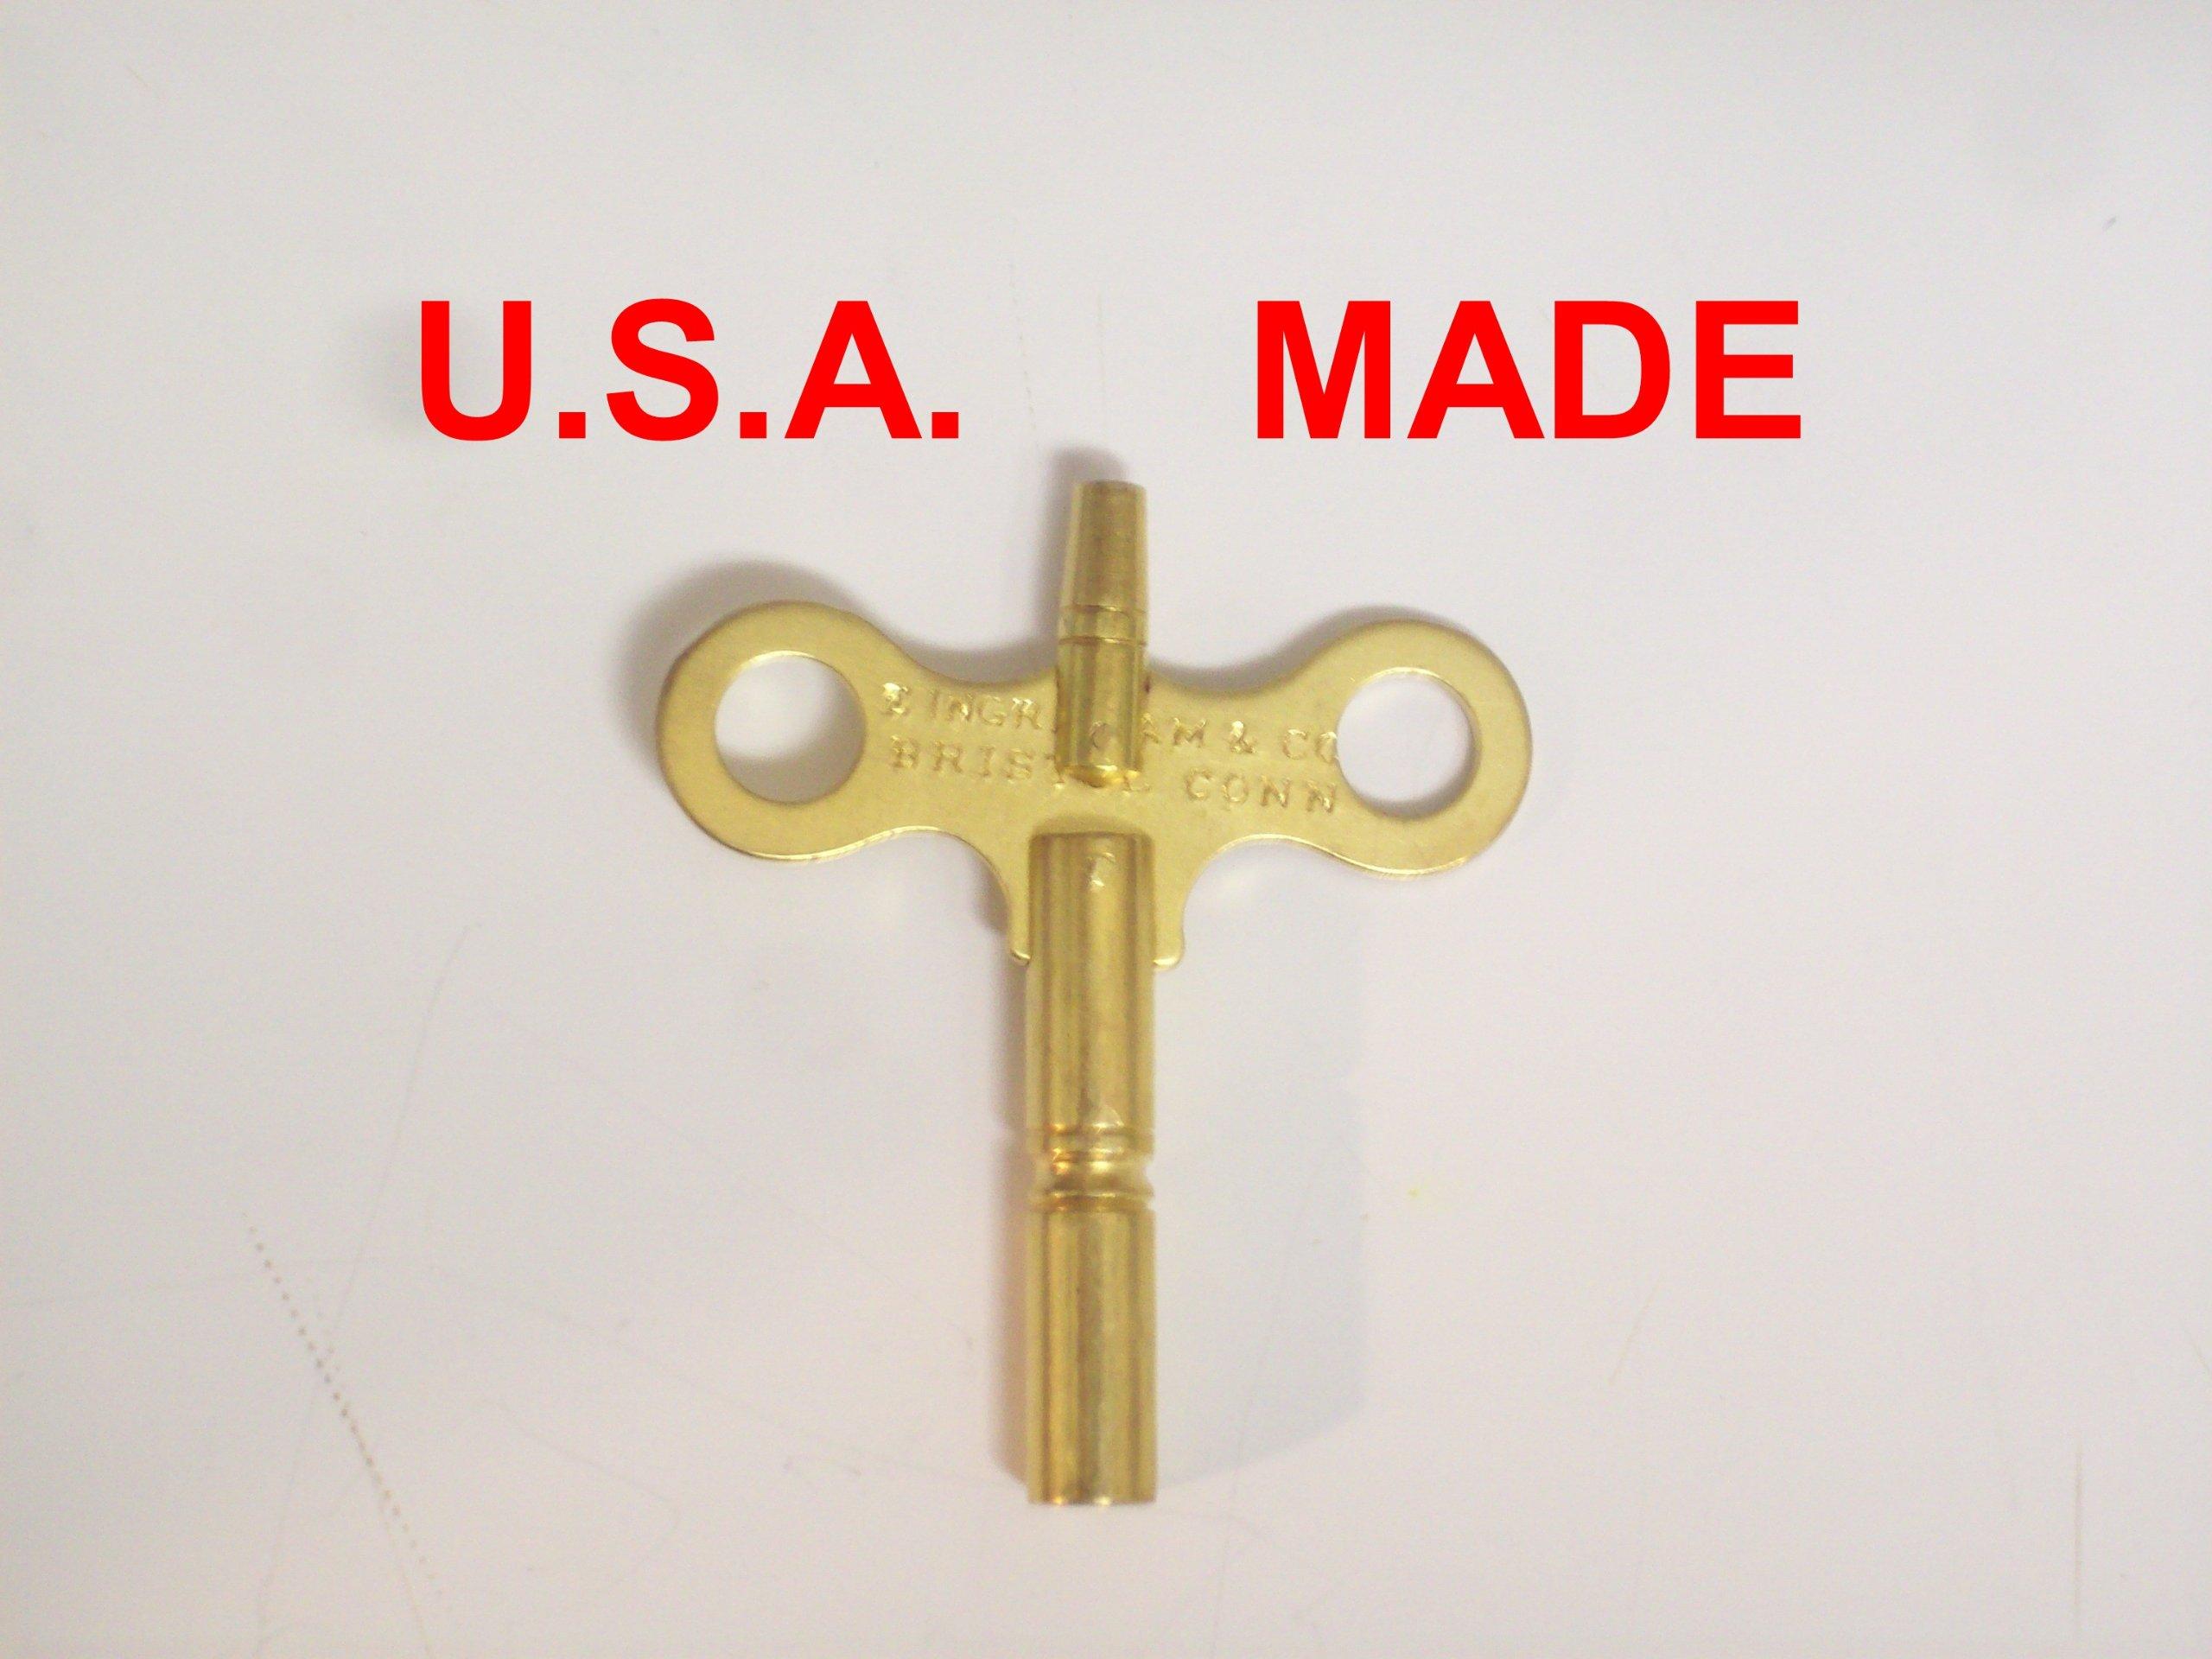 Ingraham Trademark Clock Winding Key Double End #6/000